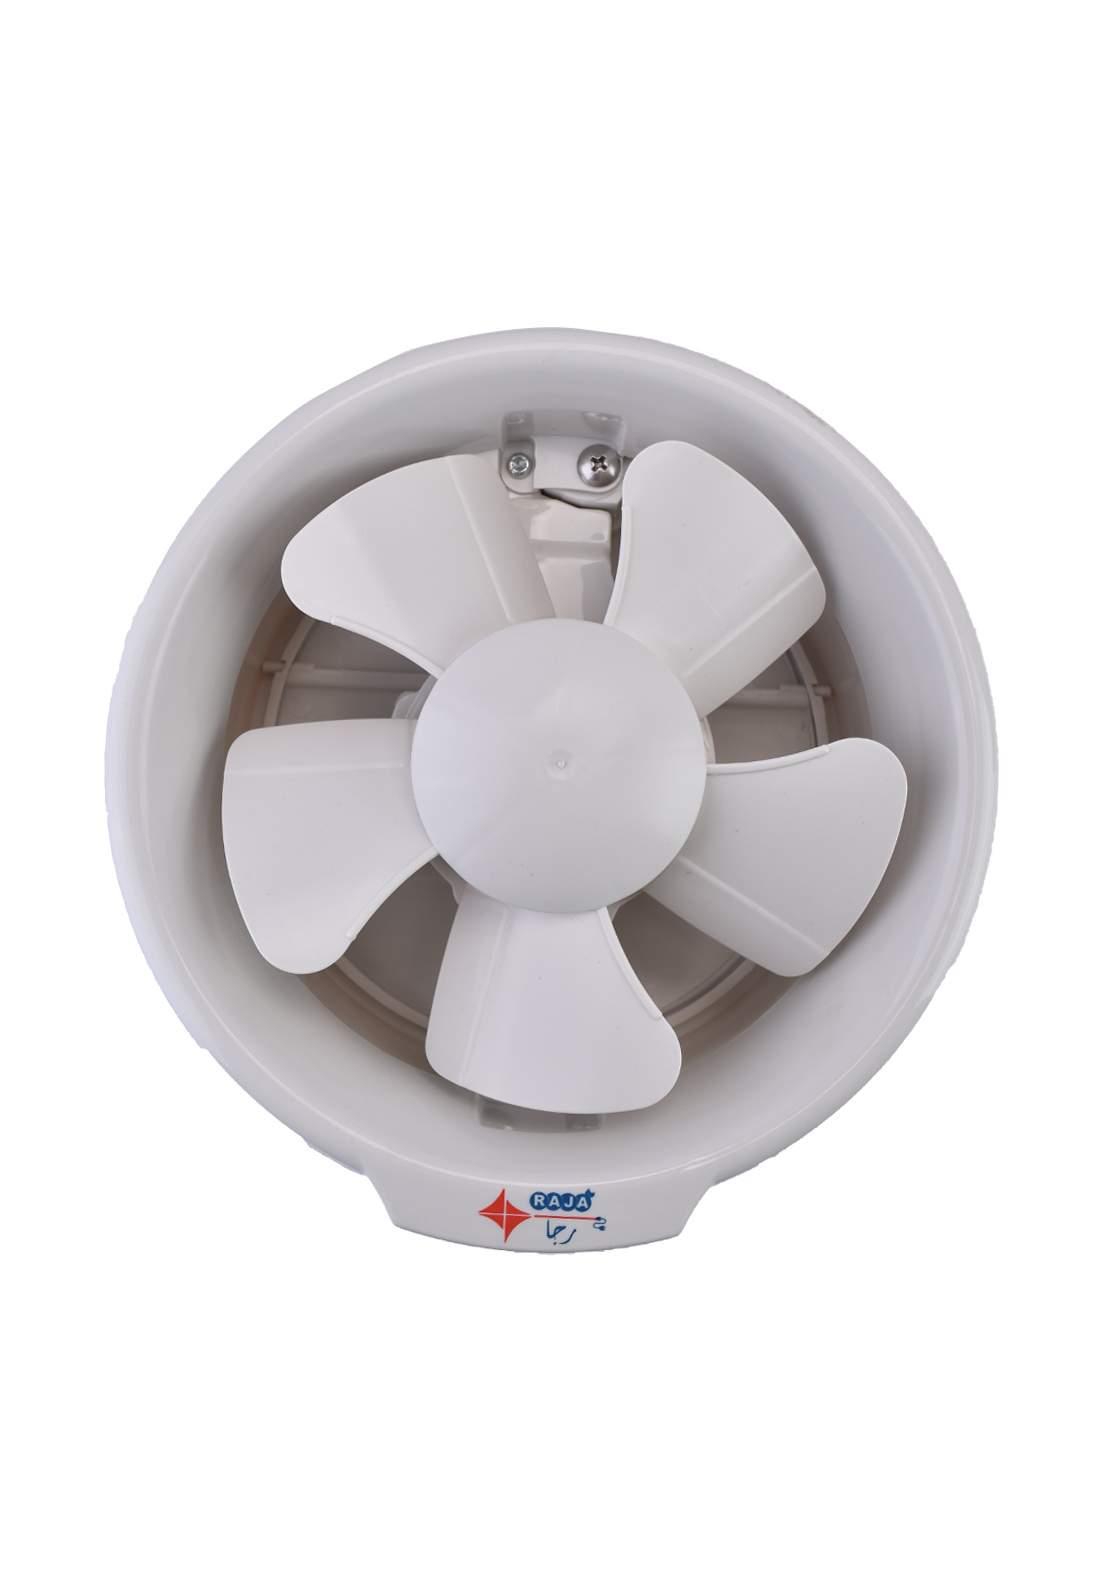 Raja VF-PC6GS Ventilating Fans 15 cm مفرغة هواء